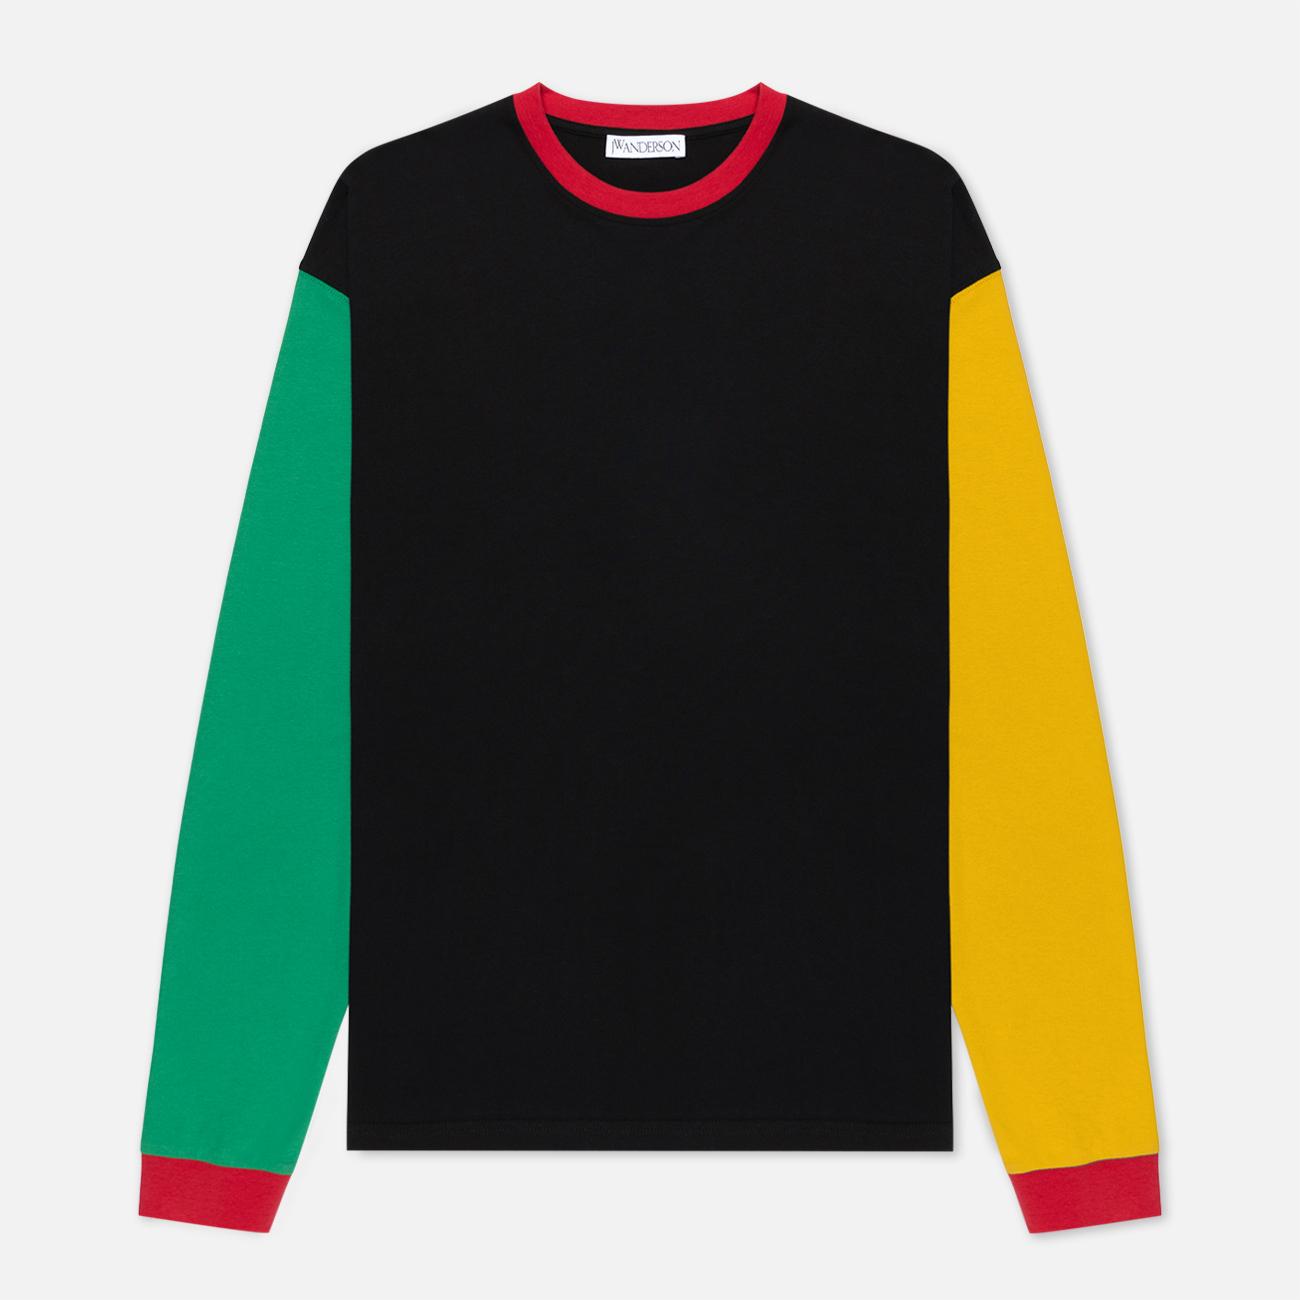 Мужской лонгслив JW Anderson Colourblock Black/Green/Yellow